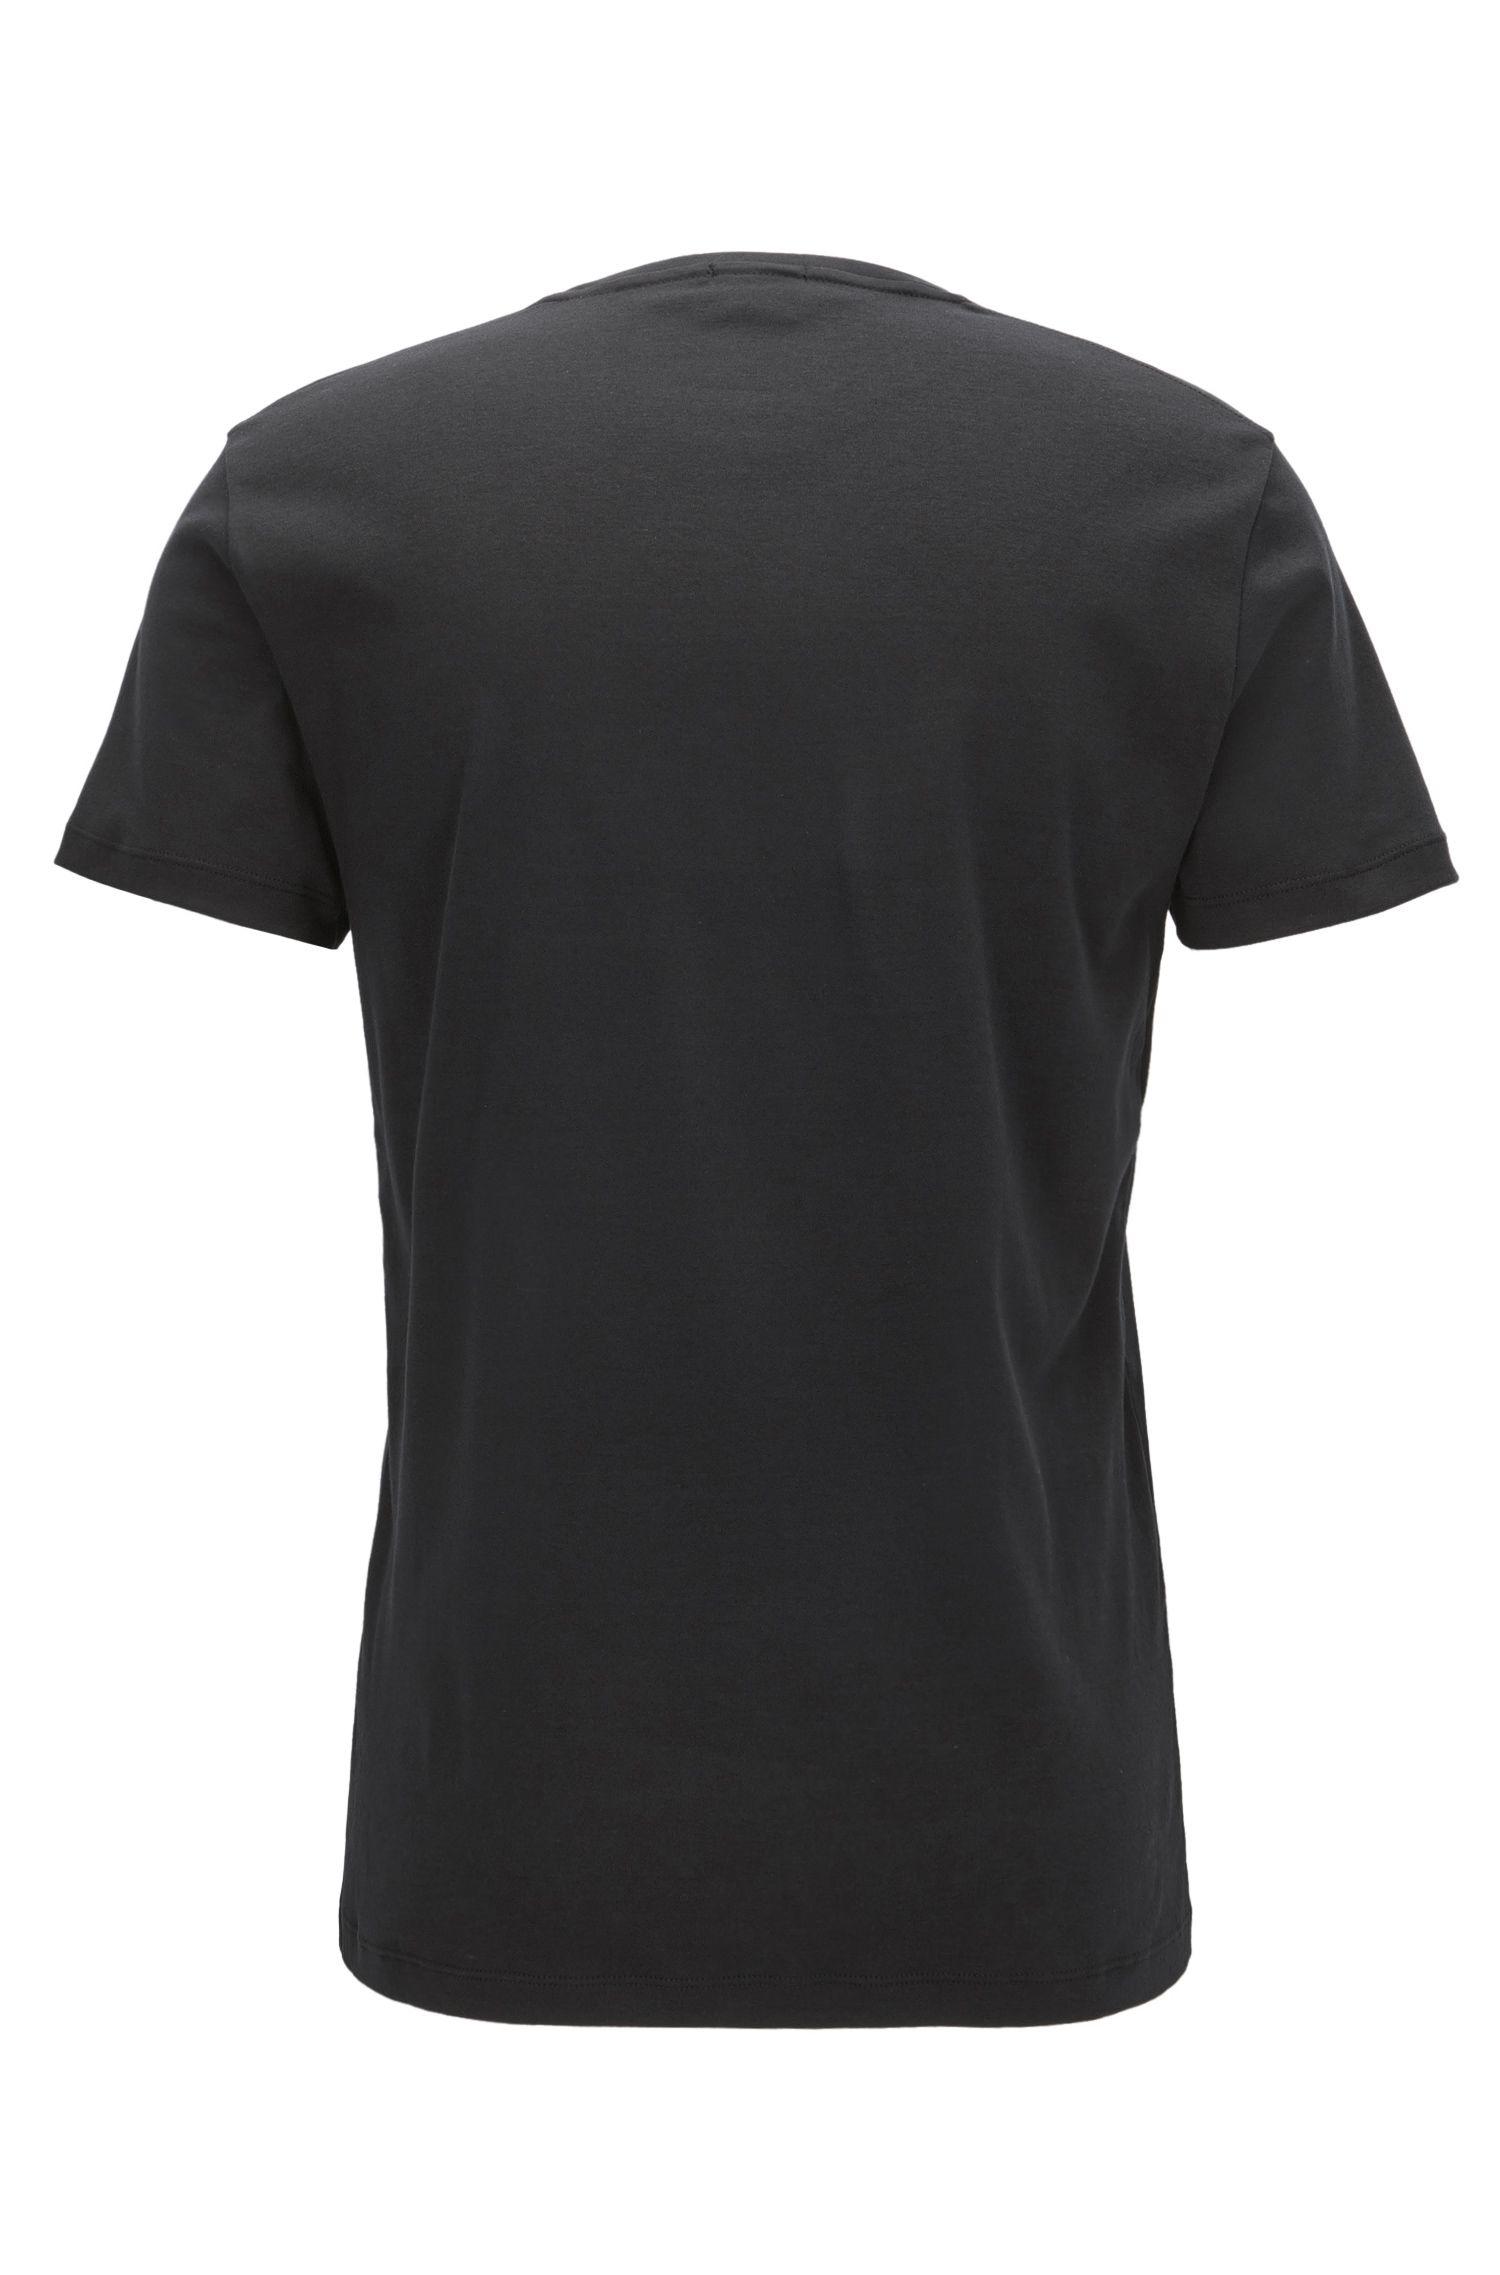 Logo-Print Graphic T-Shirt | Tessler